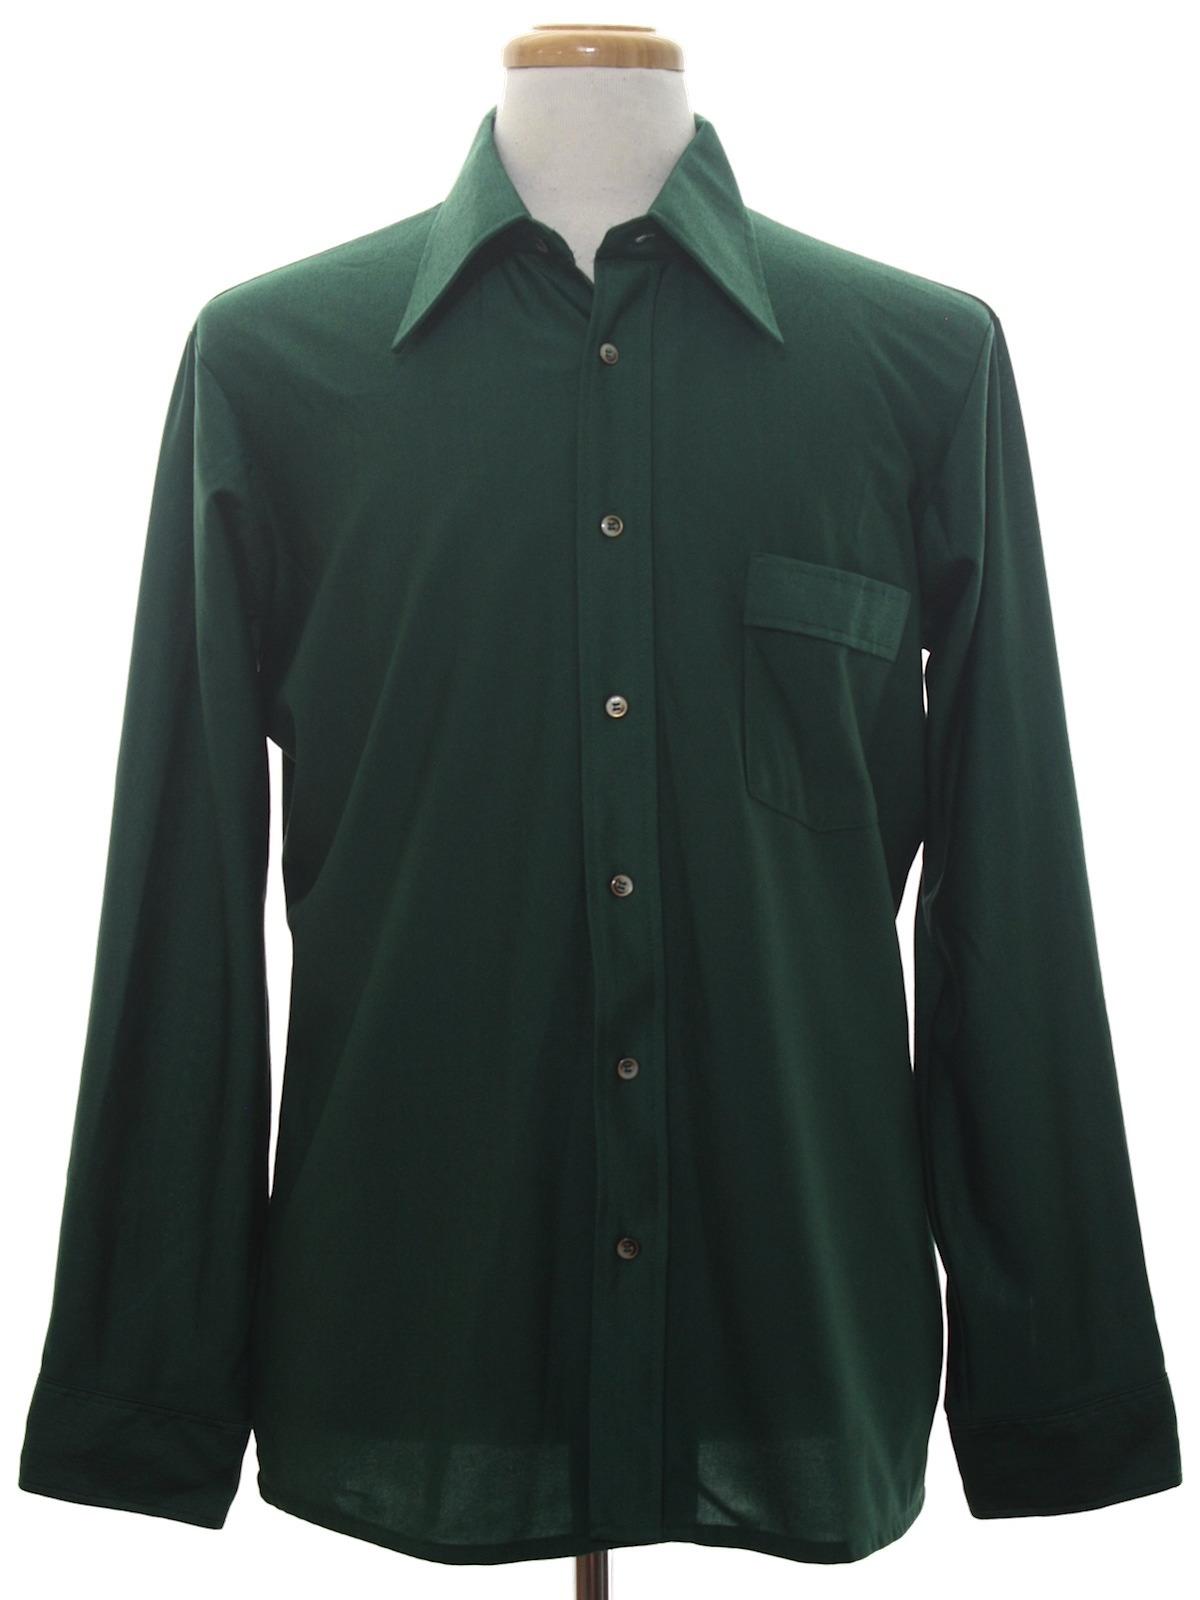 70s disco shirt van heusen 70s van heusen mens sheeny for Mens shirts with cufflink holes